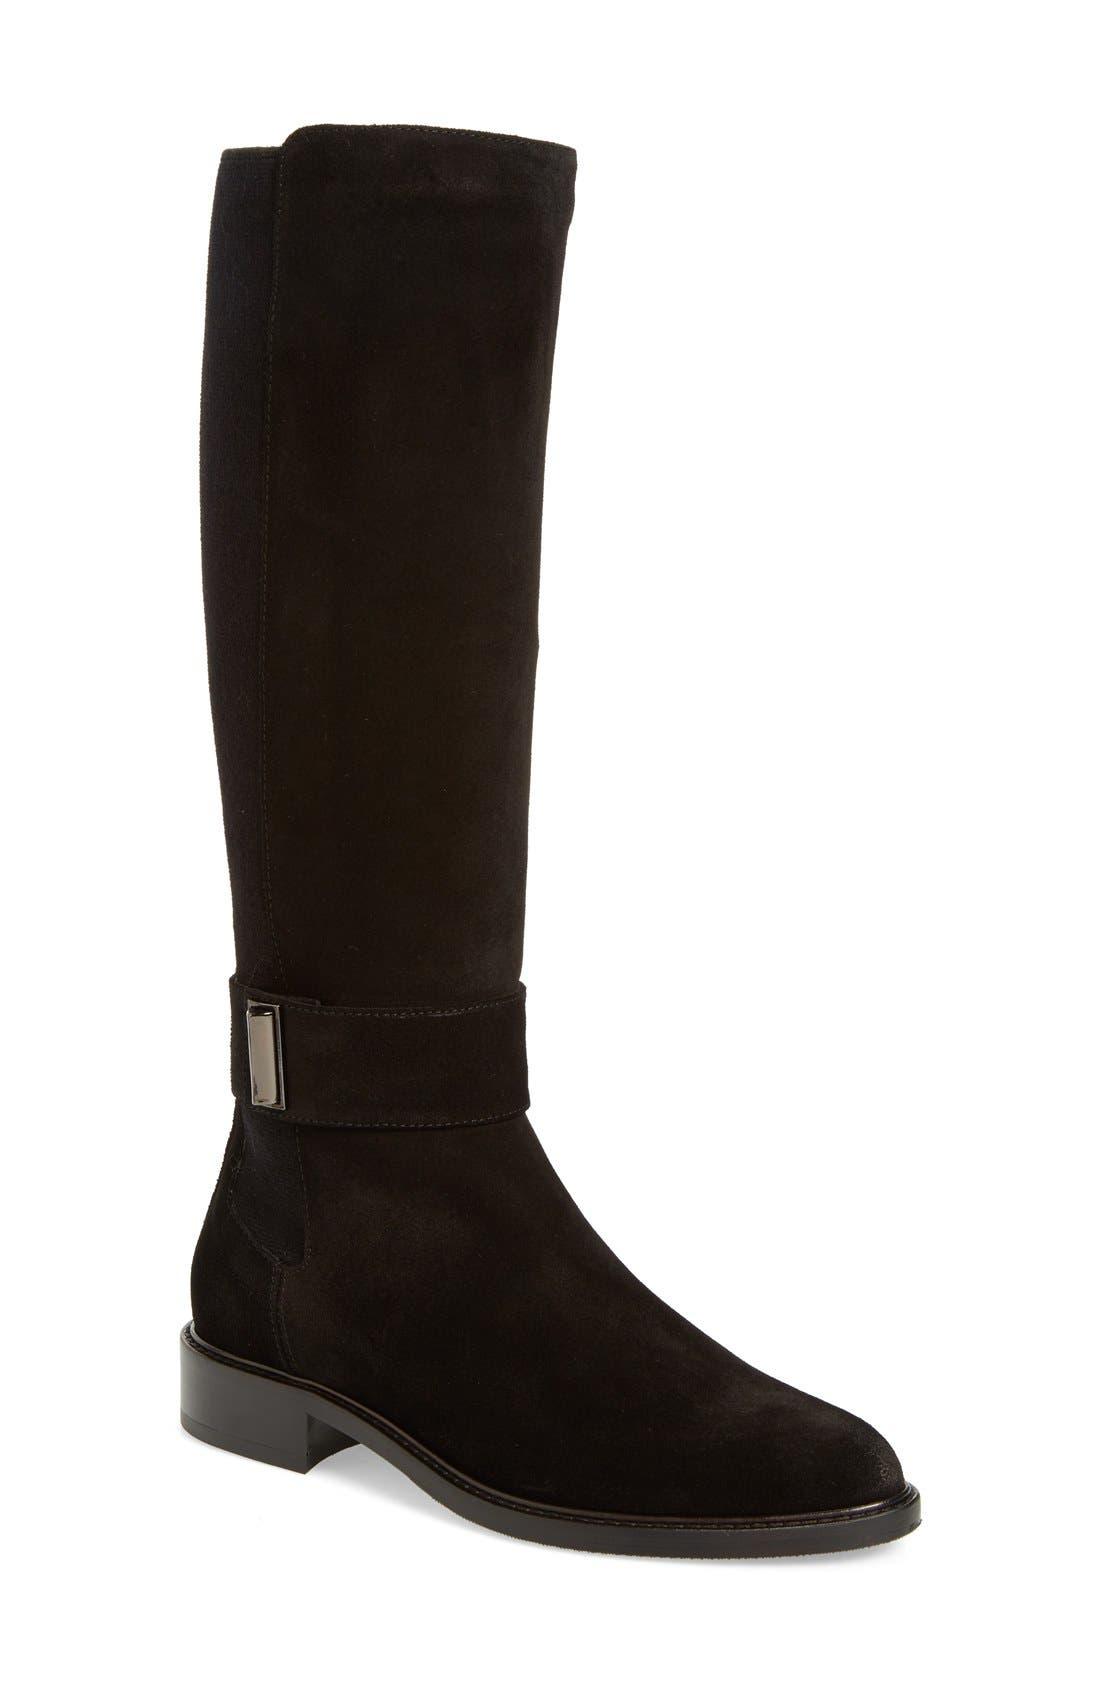 Women's Boots/aquatalia navy suede giada fh8p56d9